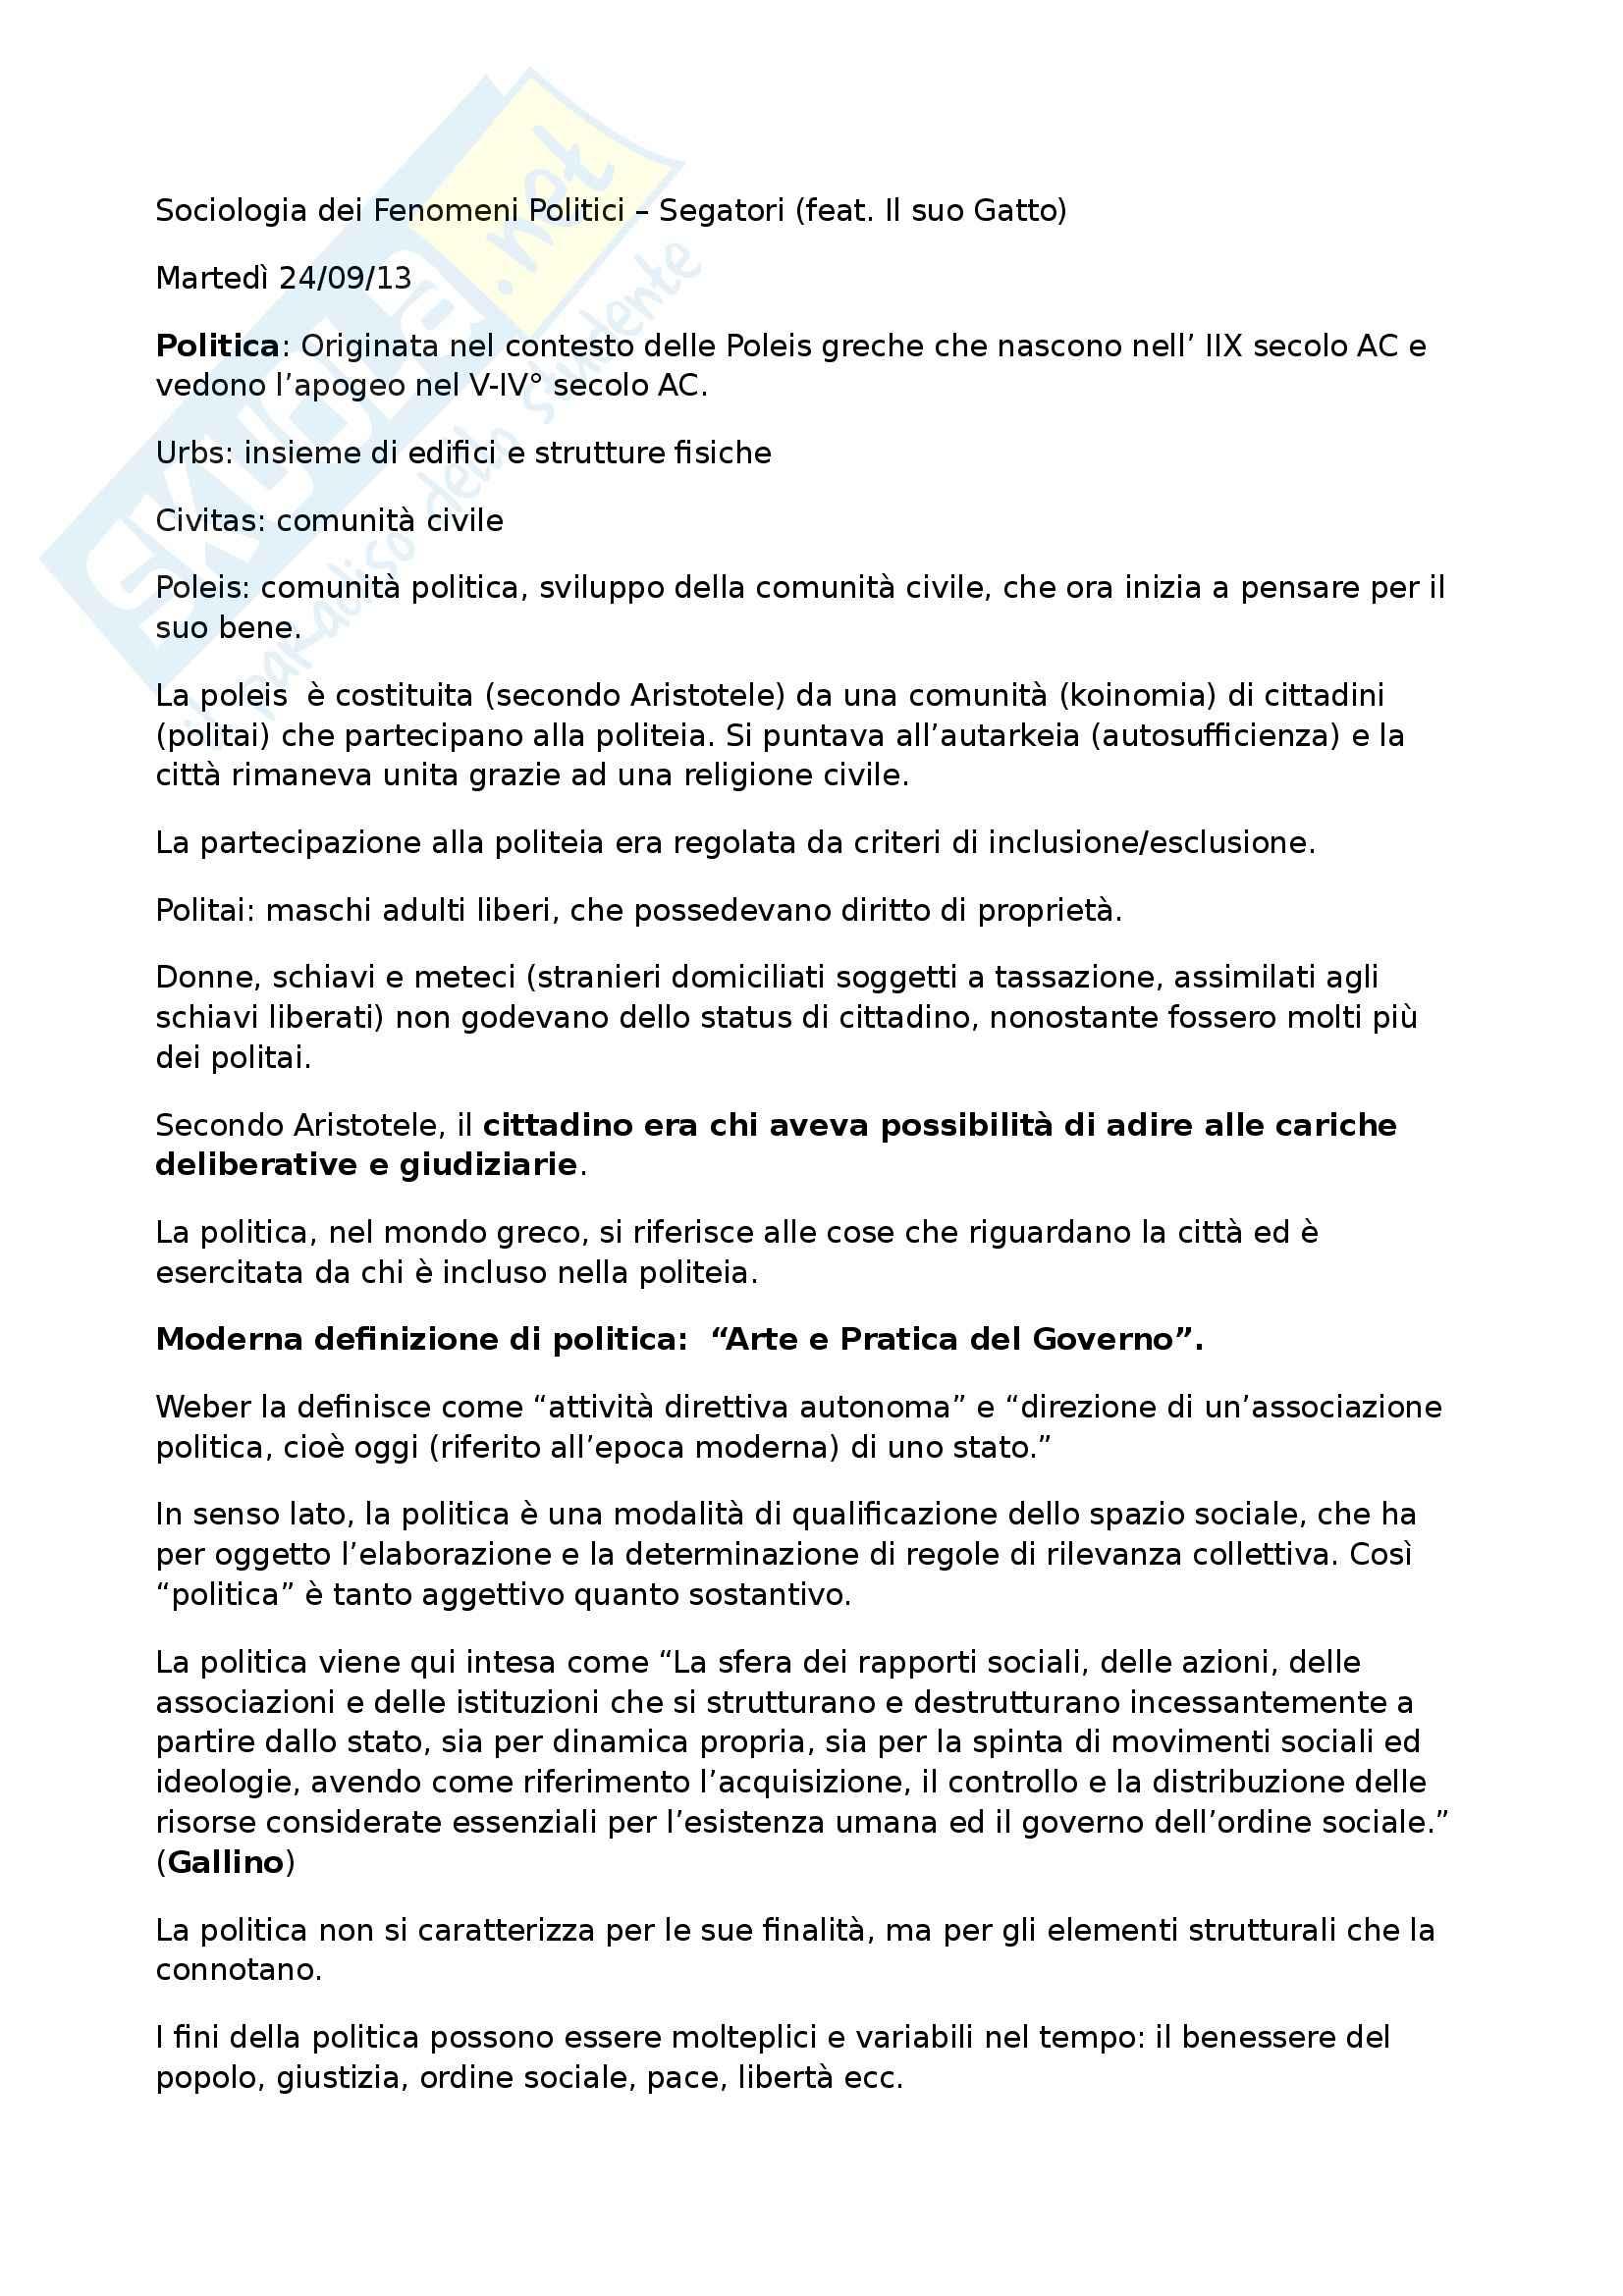 Riassunto esame Sociologia dei Fenomeni Politici, prof. Segatori